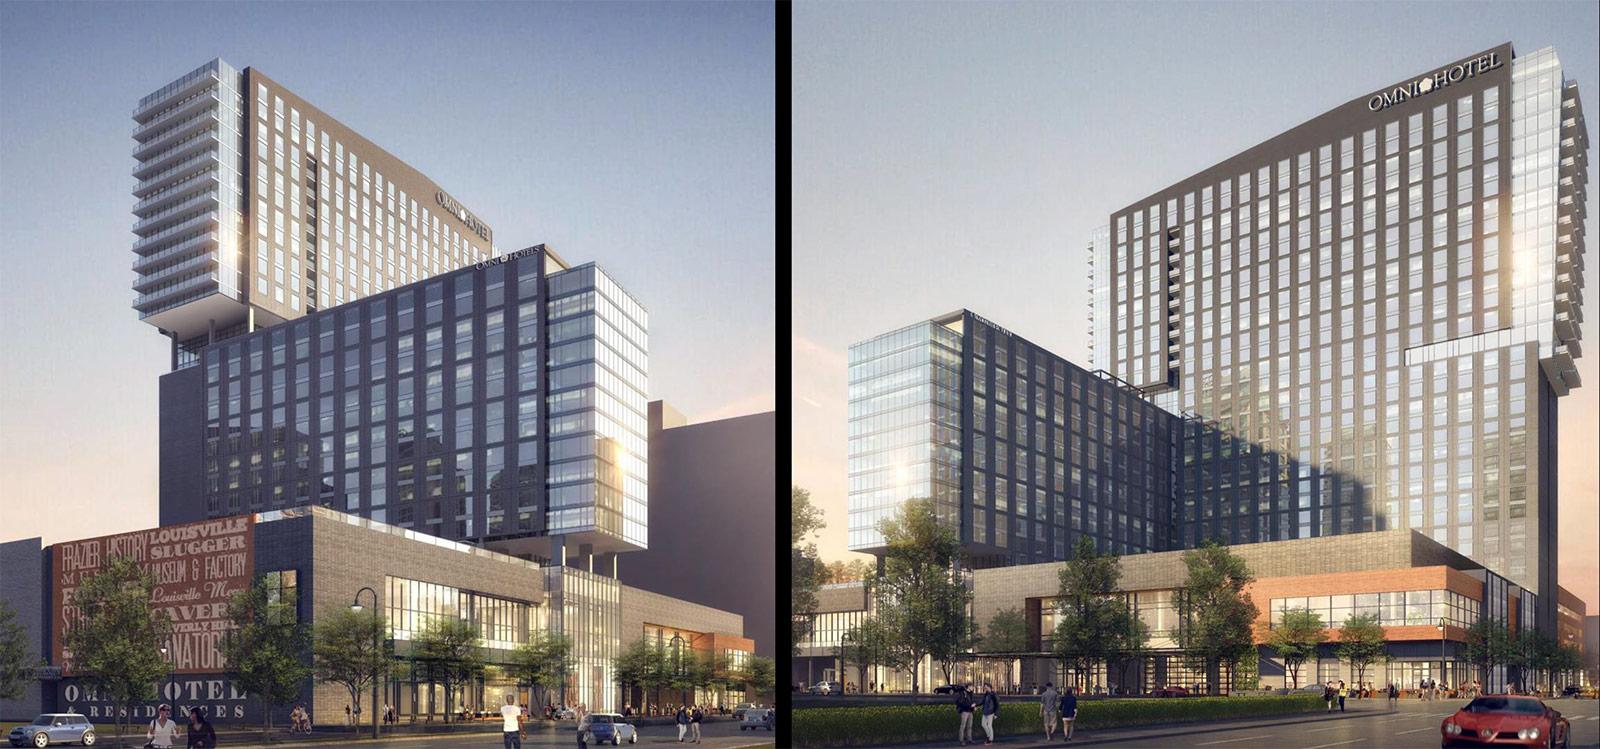 Renderings of the planned Omni Hotel & Residences. (Courtesy Omni / HKS)